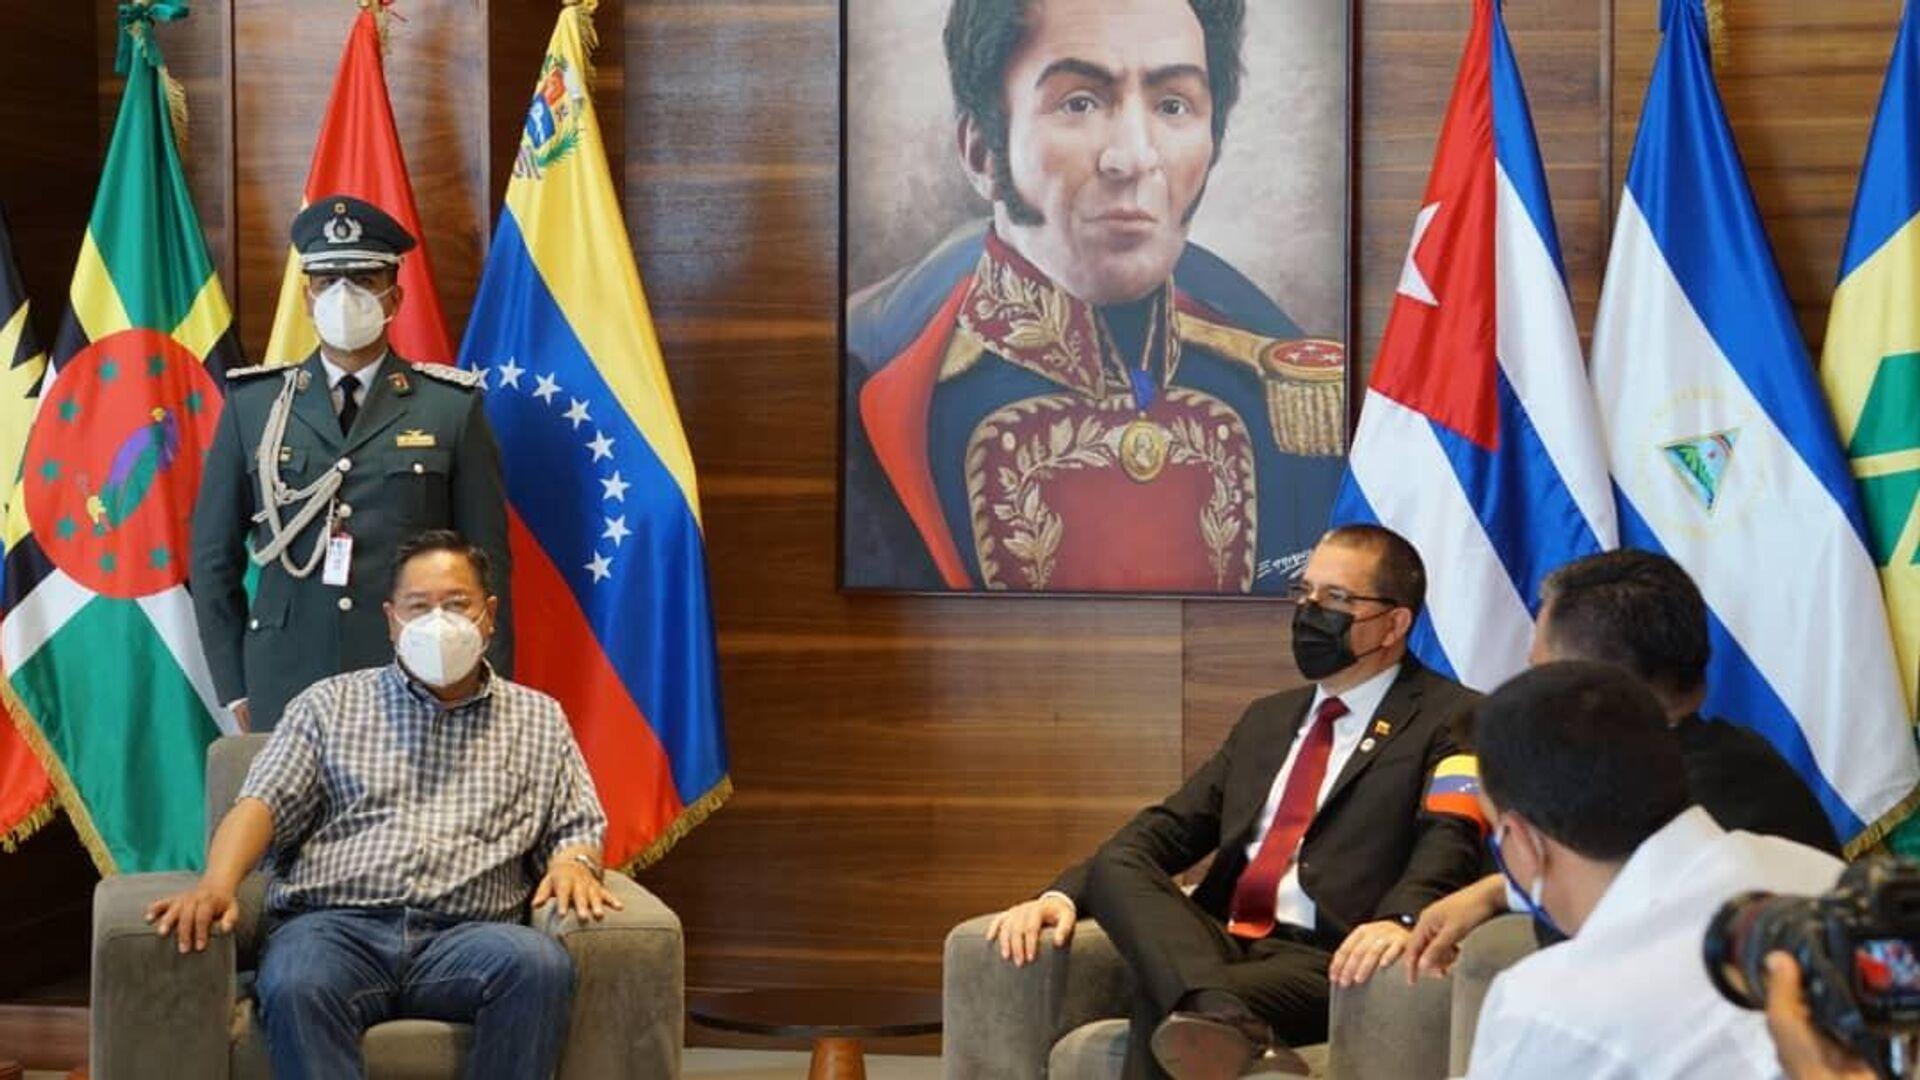 El presidente de Bolivia, Luis Arce, en Venezuela - Sputnik Mundo, 1920, 24.06.2021